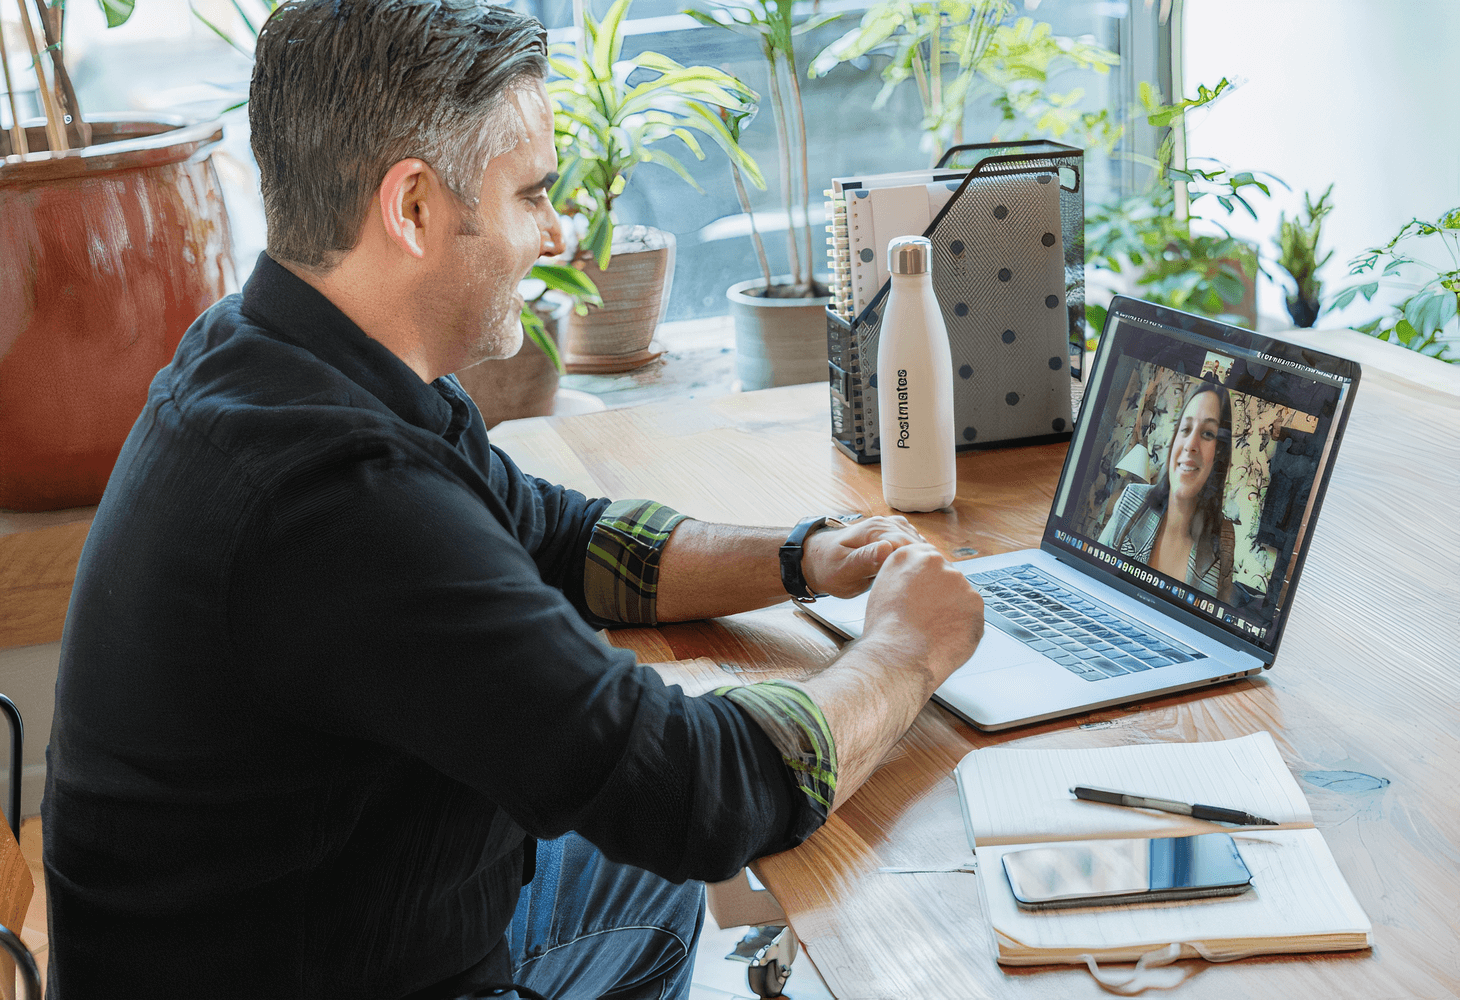 An image of a man looking at his computer screen